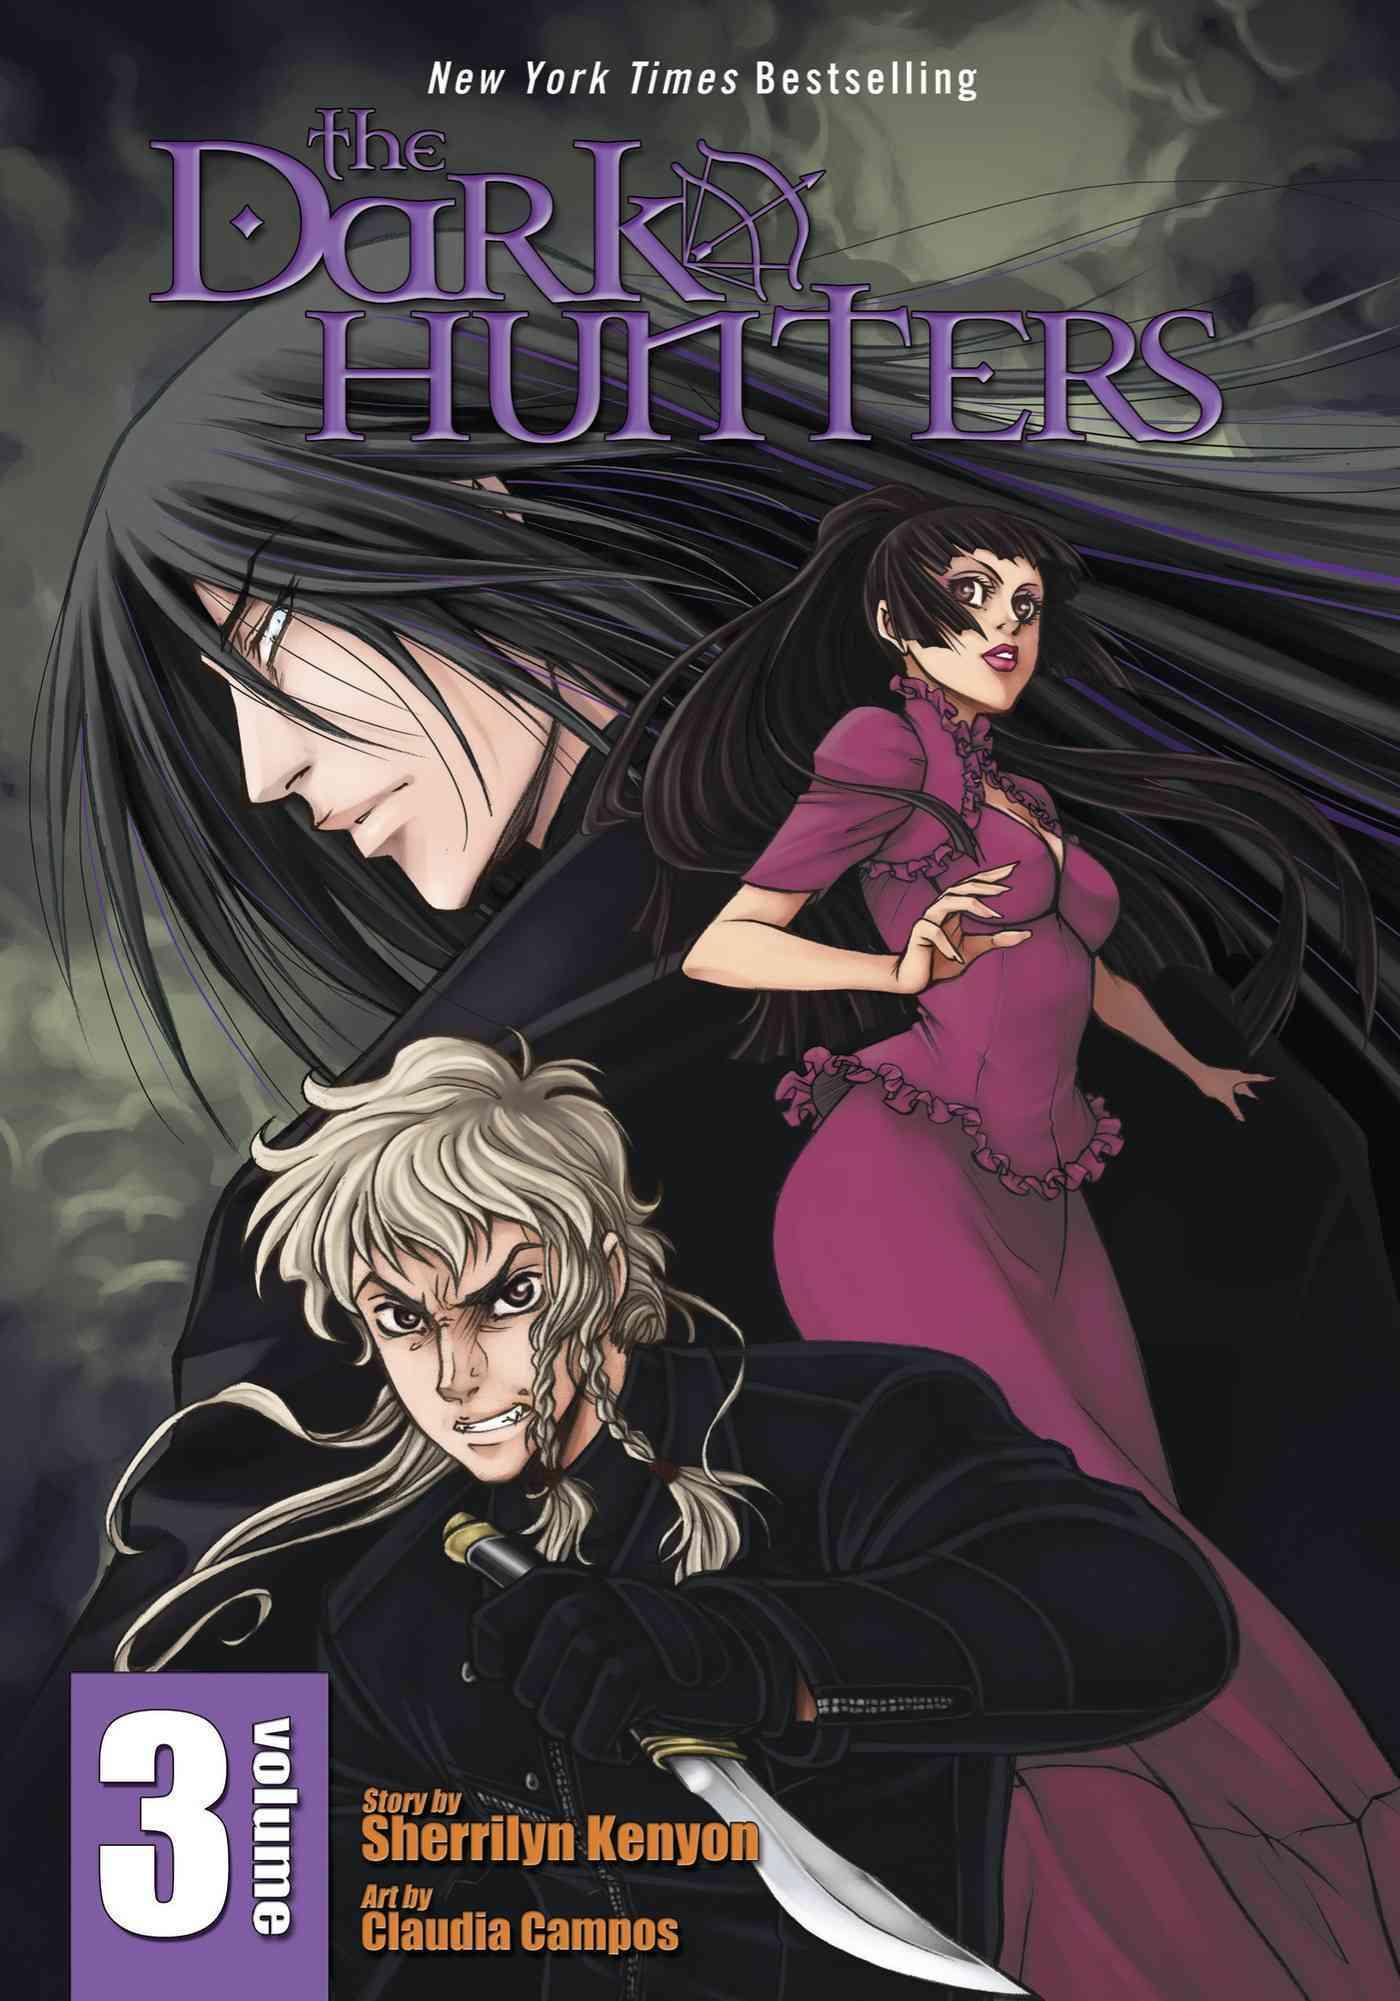 The Dark-hunters 3 (Paperback)